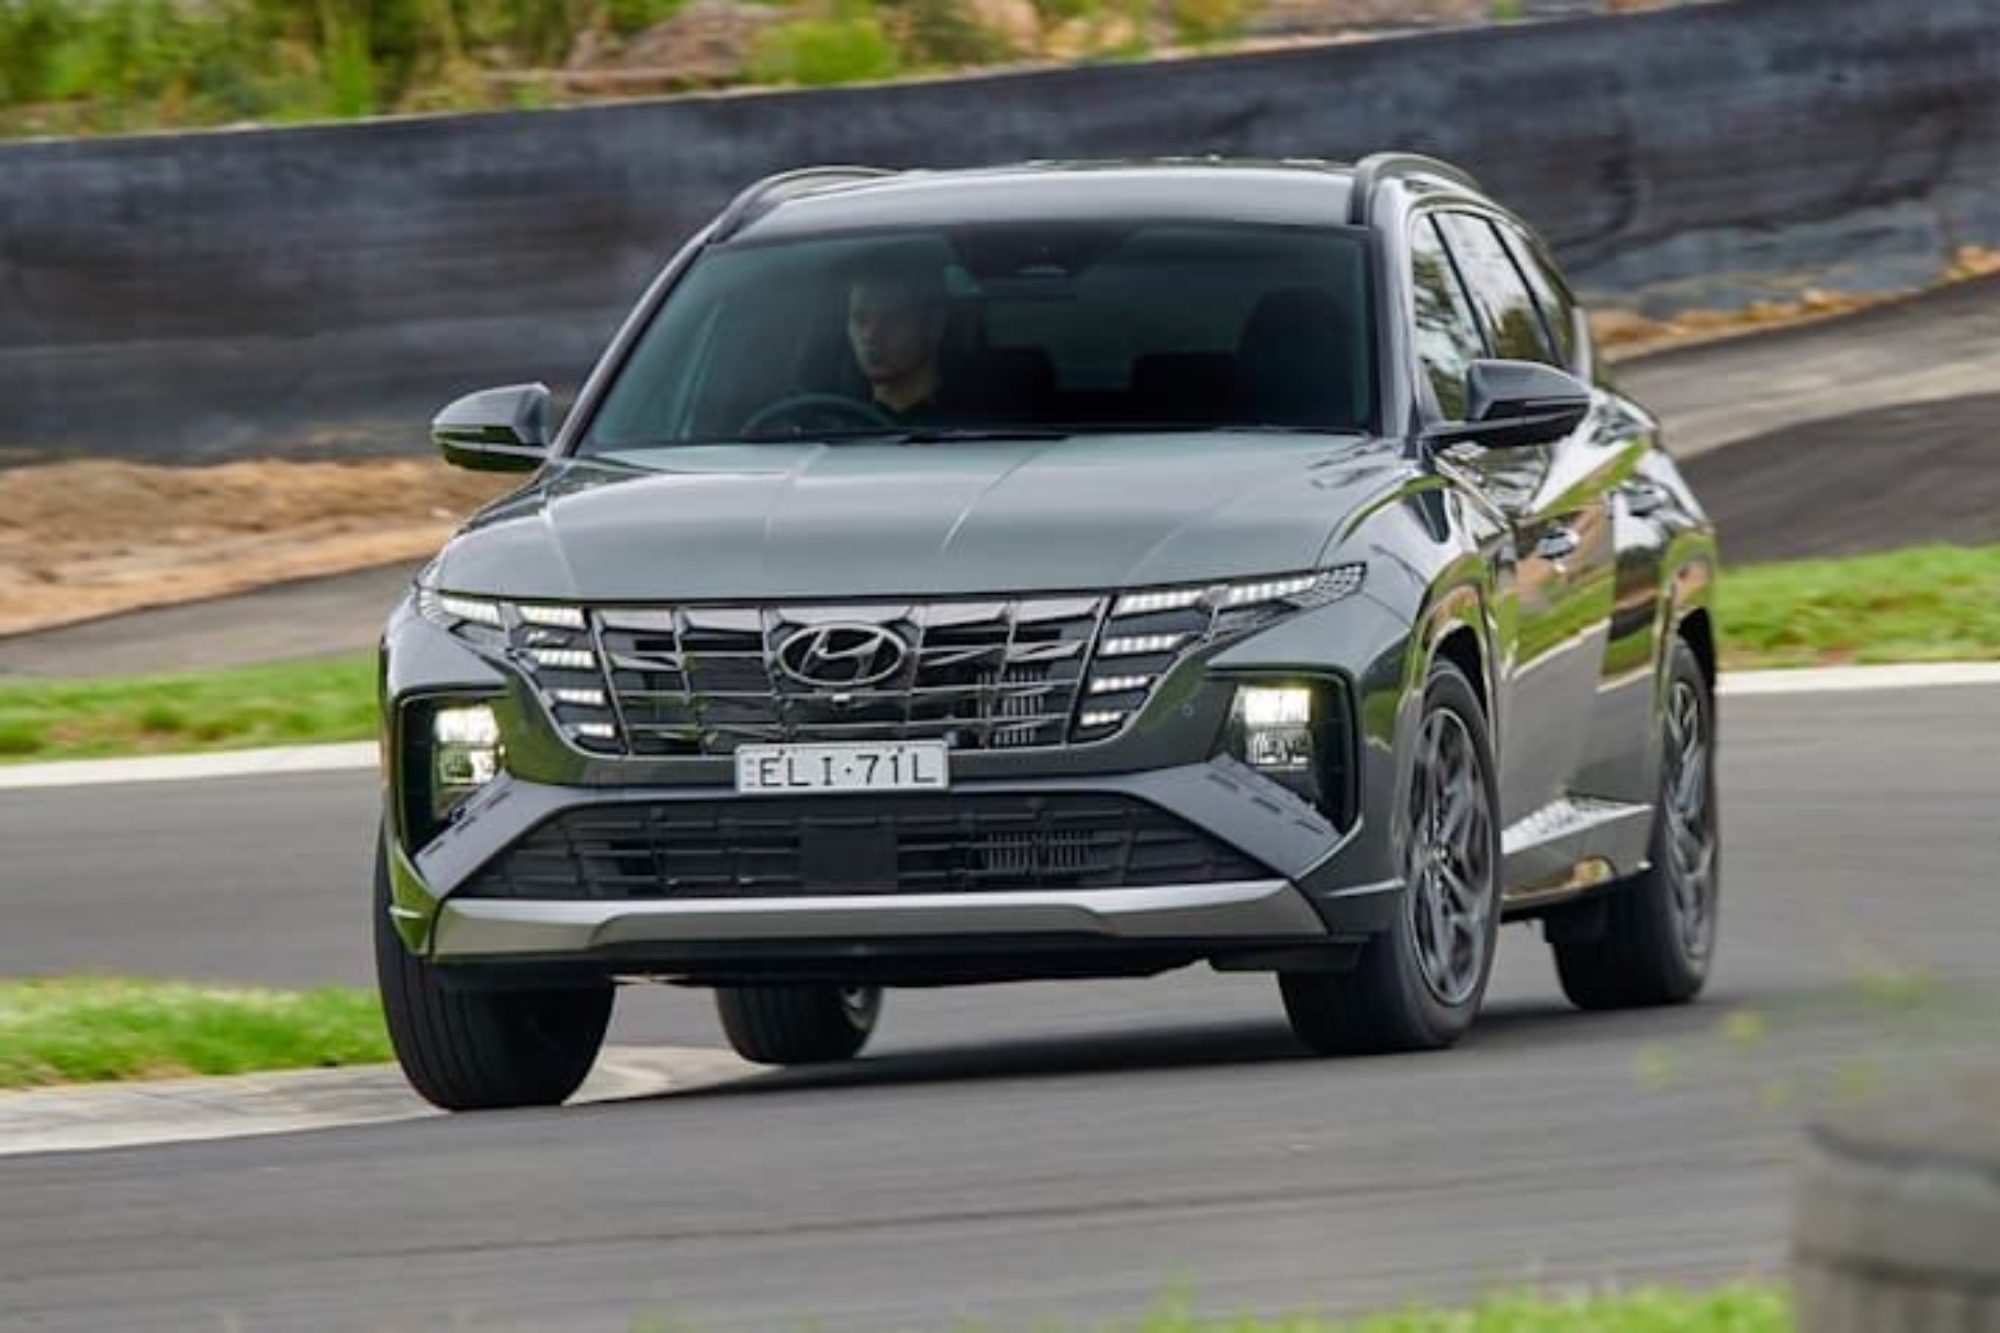 2021 Hyundai Tucson N Line Prototype Review Australia 9 1 Jpg